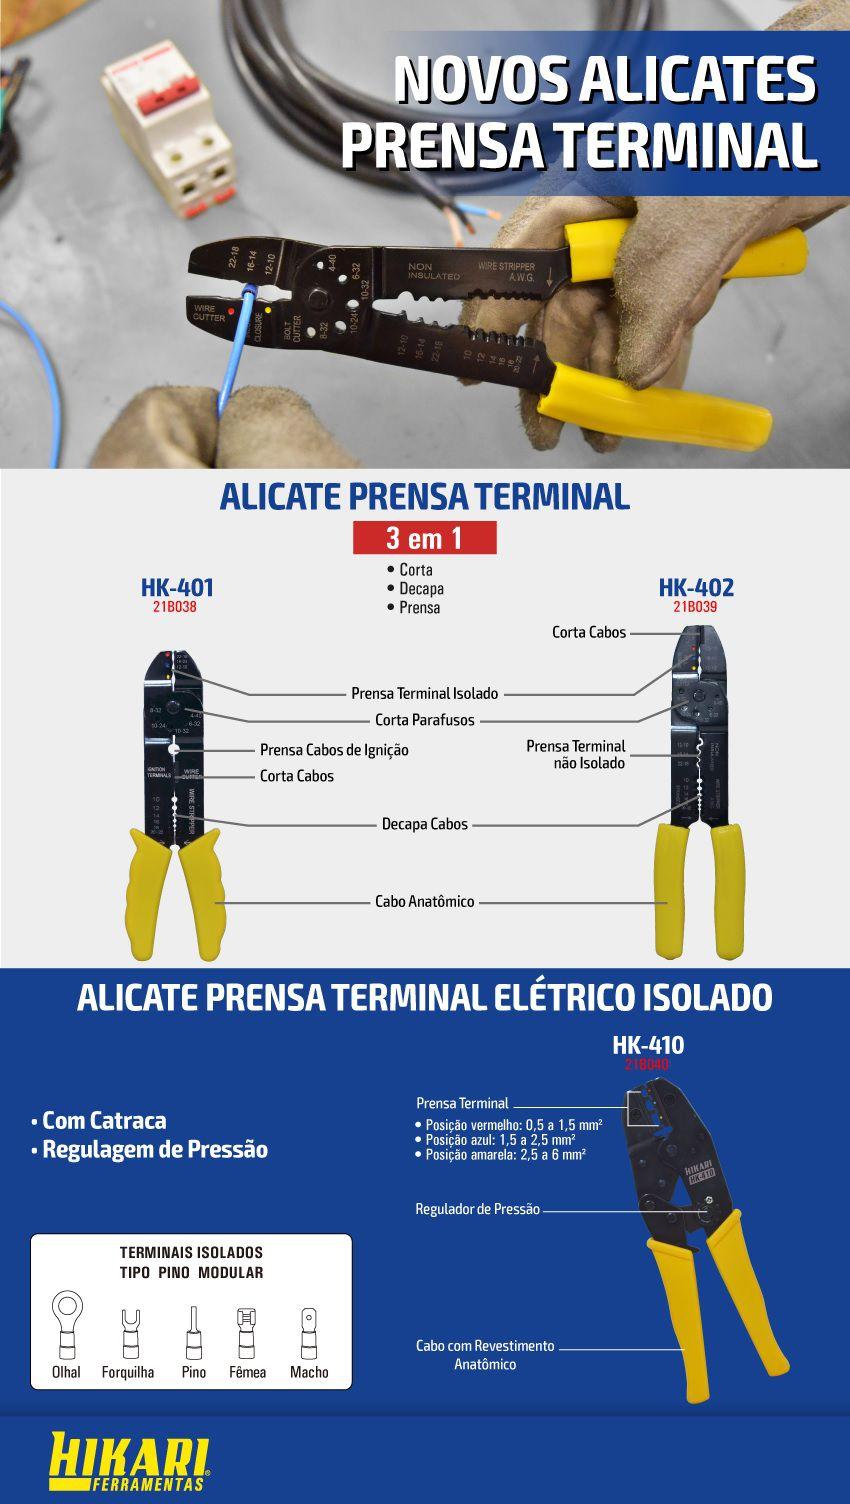 Alicate Prensa Terminal Hikari HK-410  - MRE Ferramentas